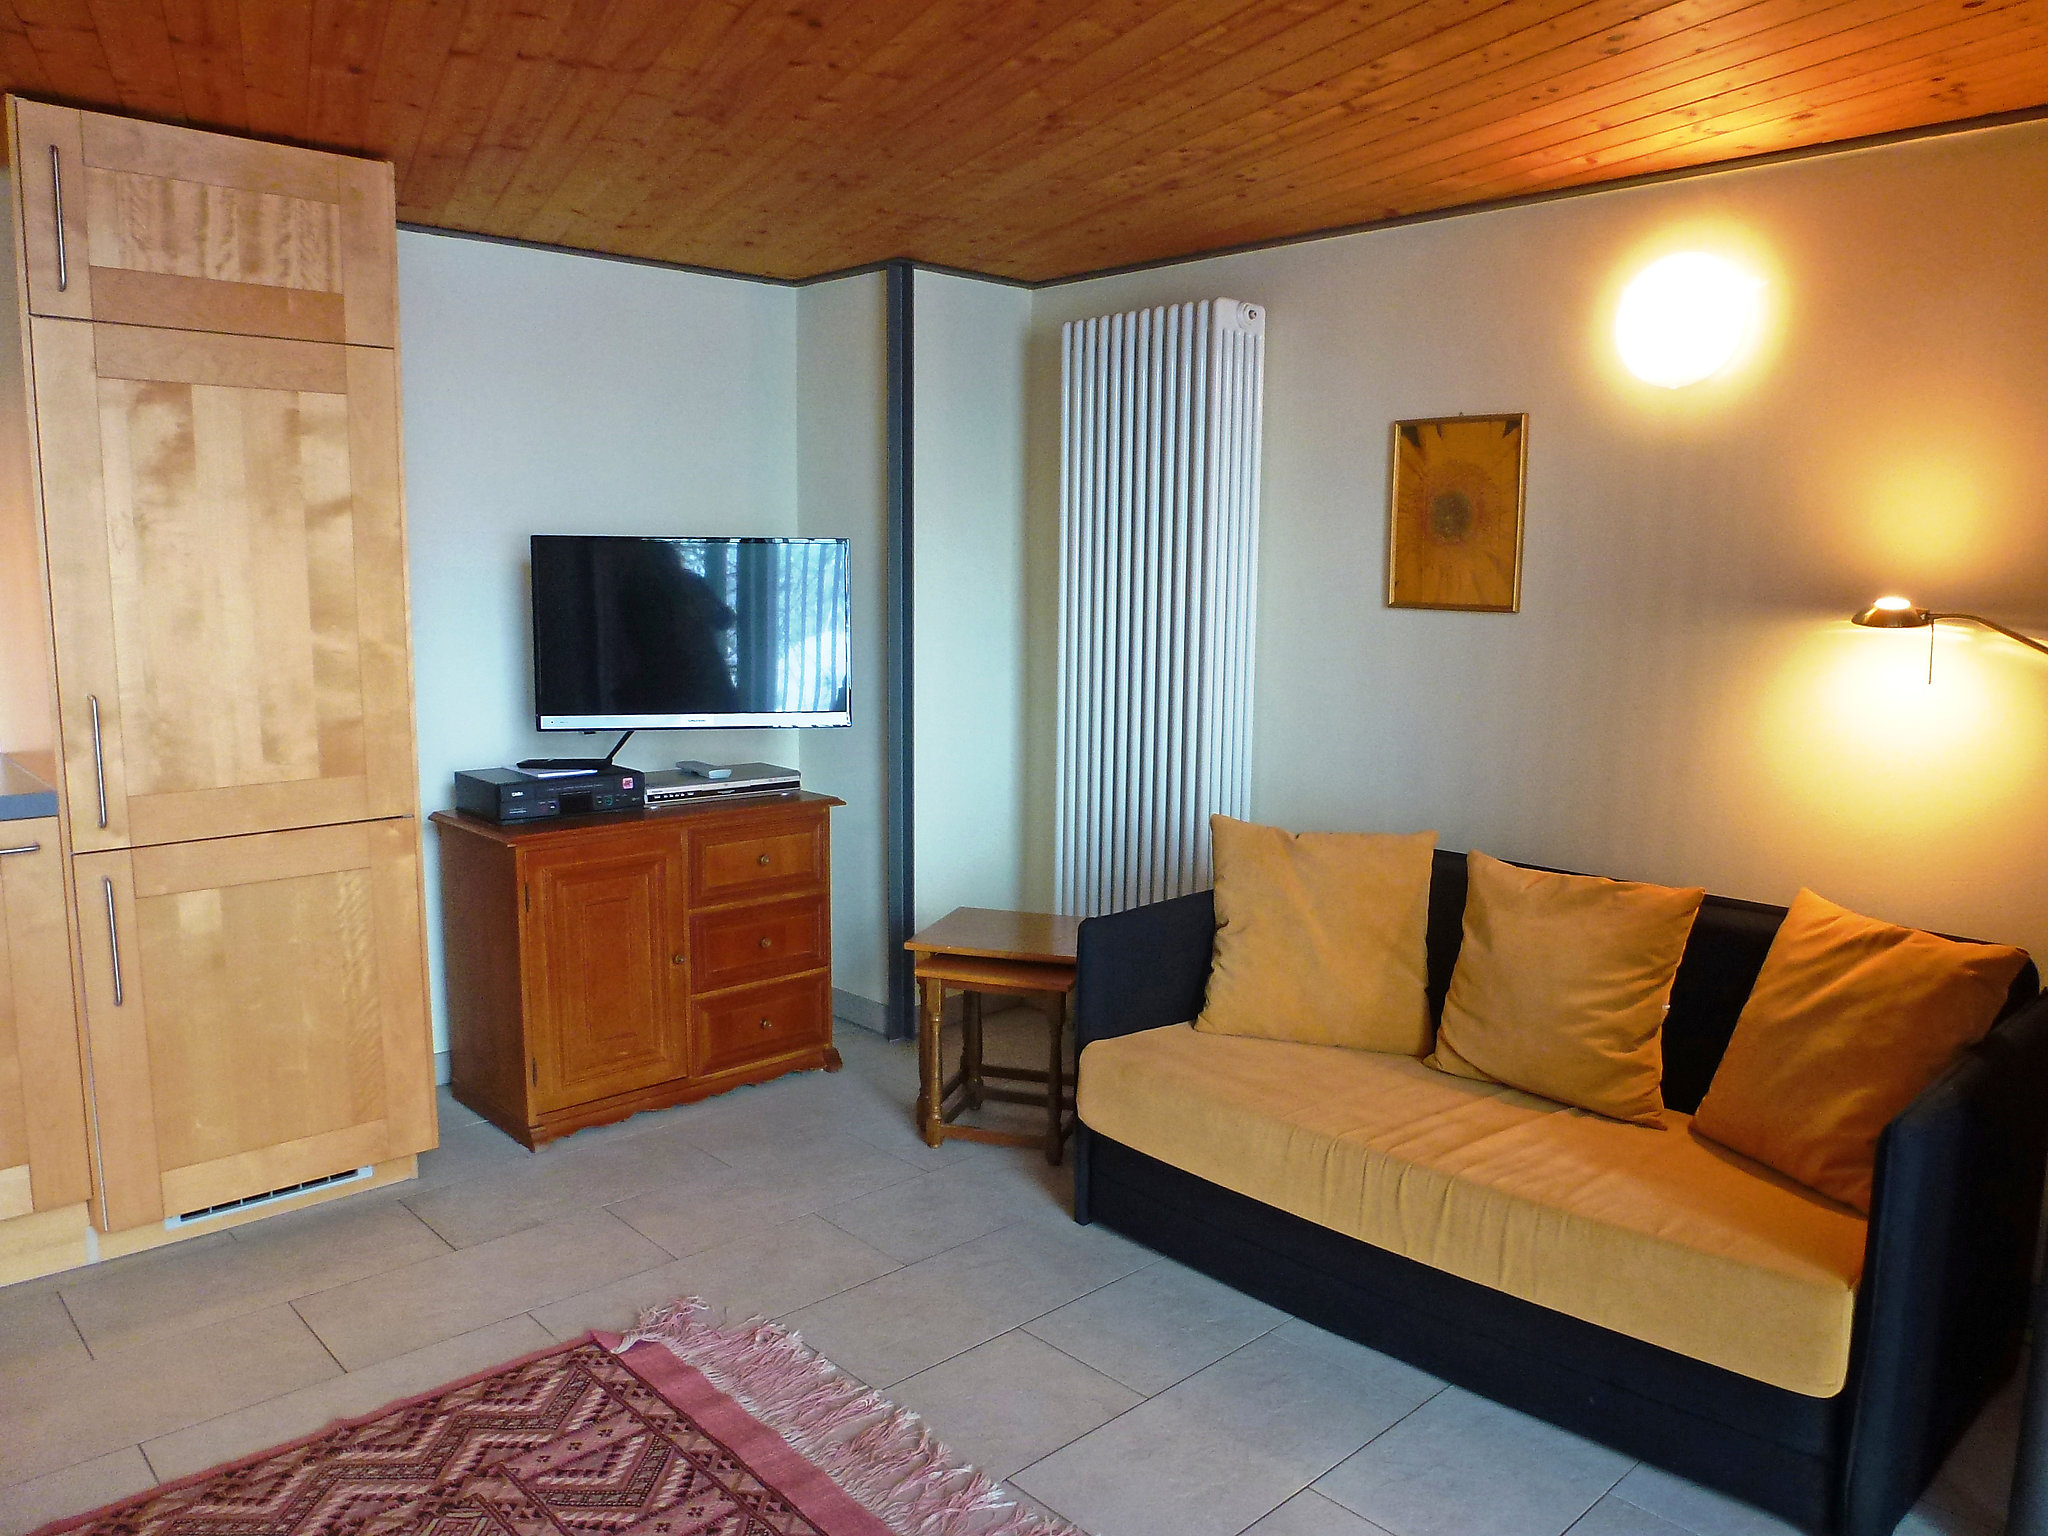 Apartment 38022 Germany, Lossburg